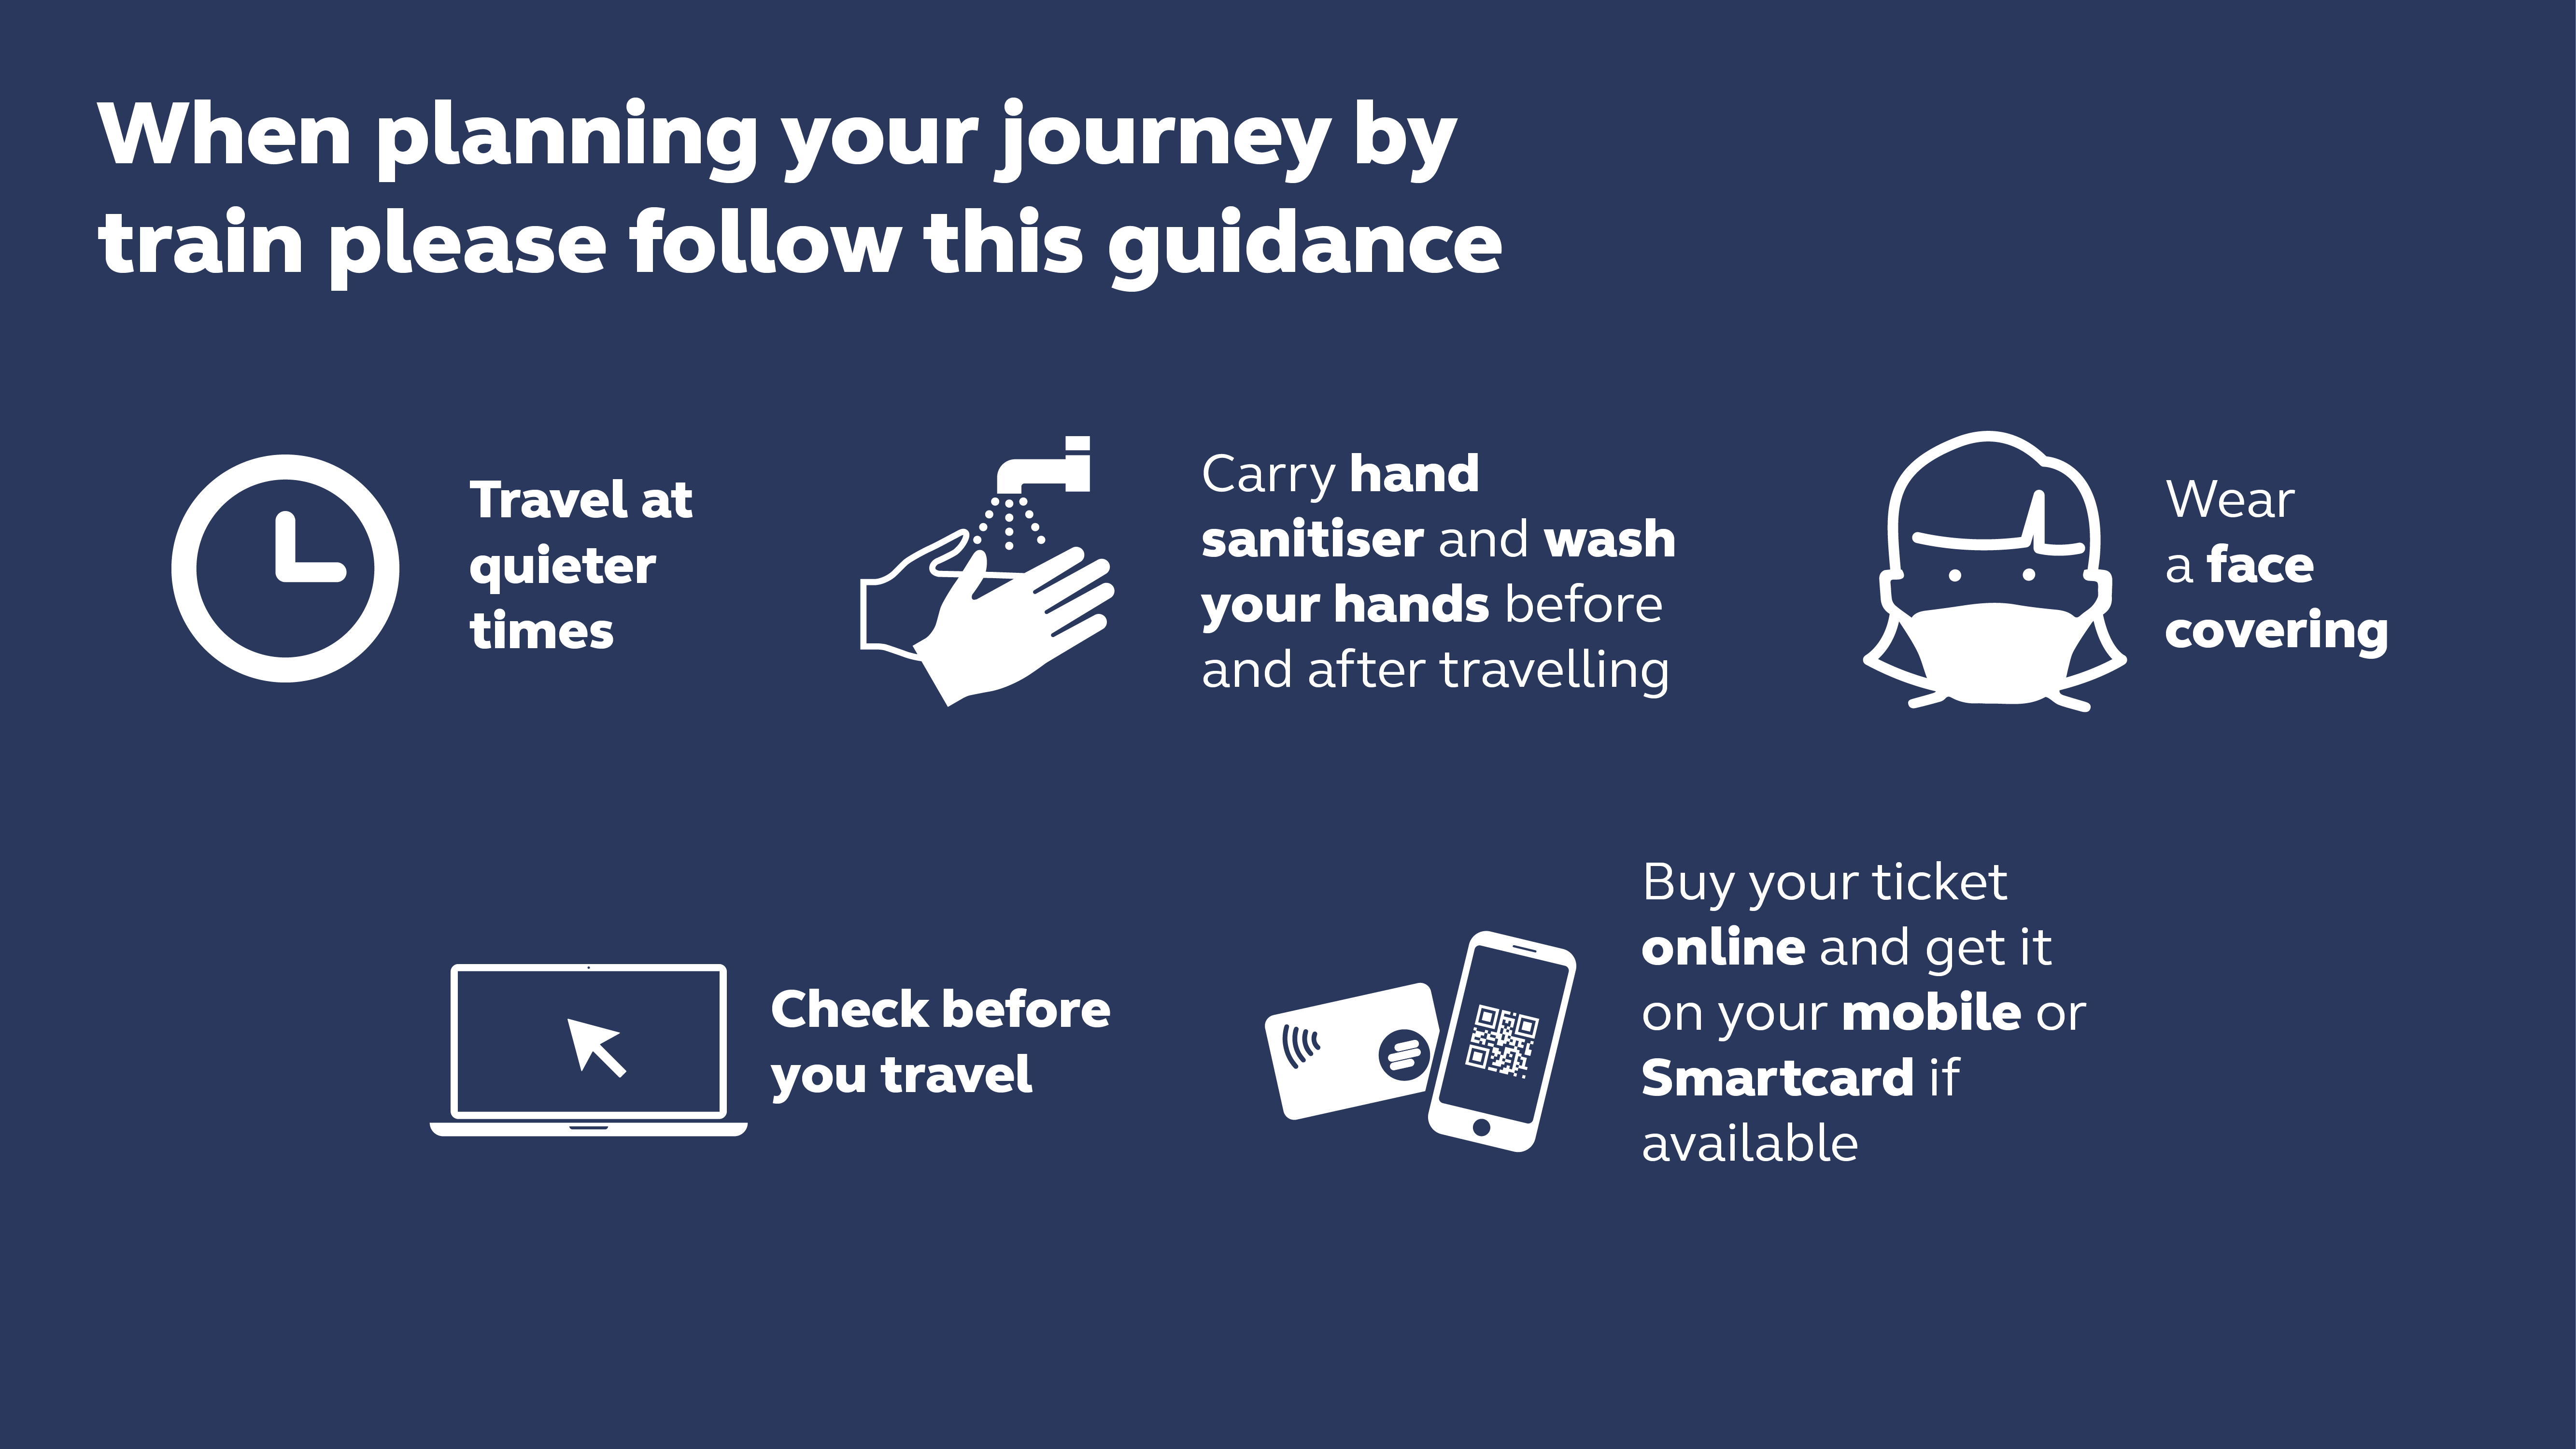 Covid19 Travel Advice